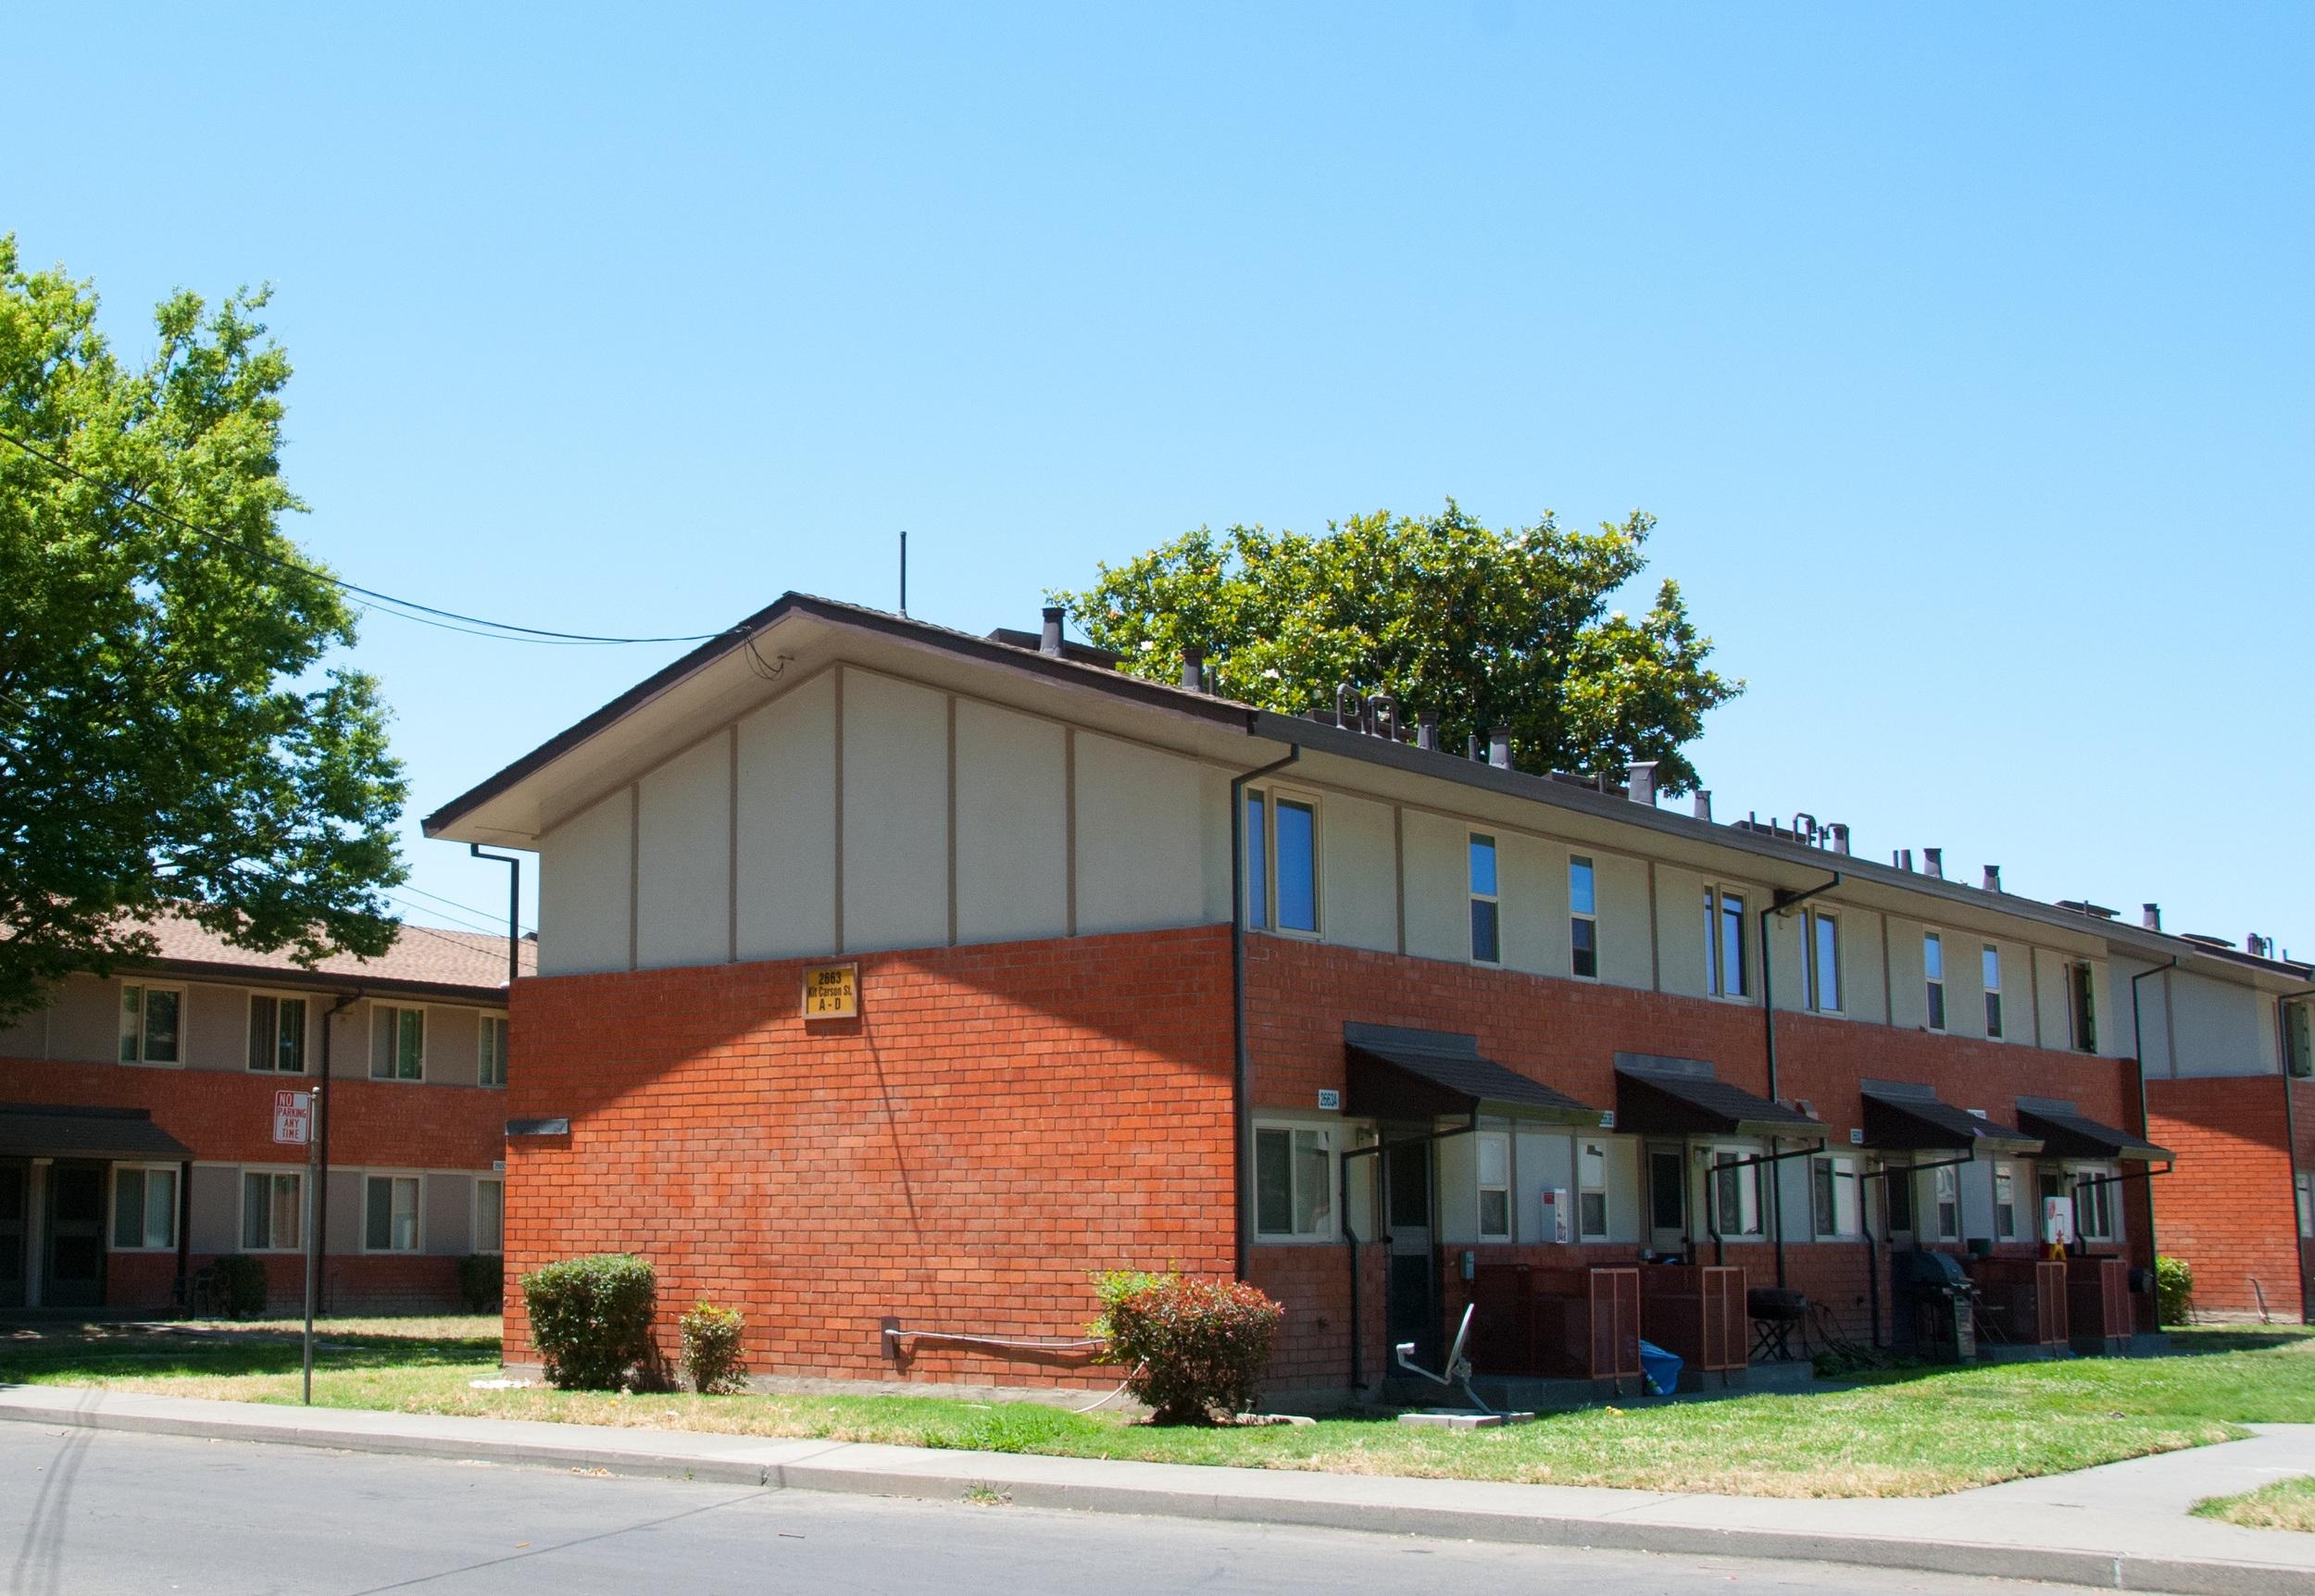 CA_Sacramento_New_Helvetia_Historic_District_0013.jpg